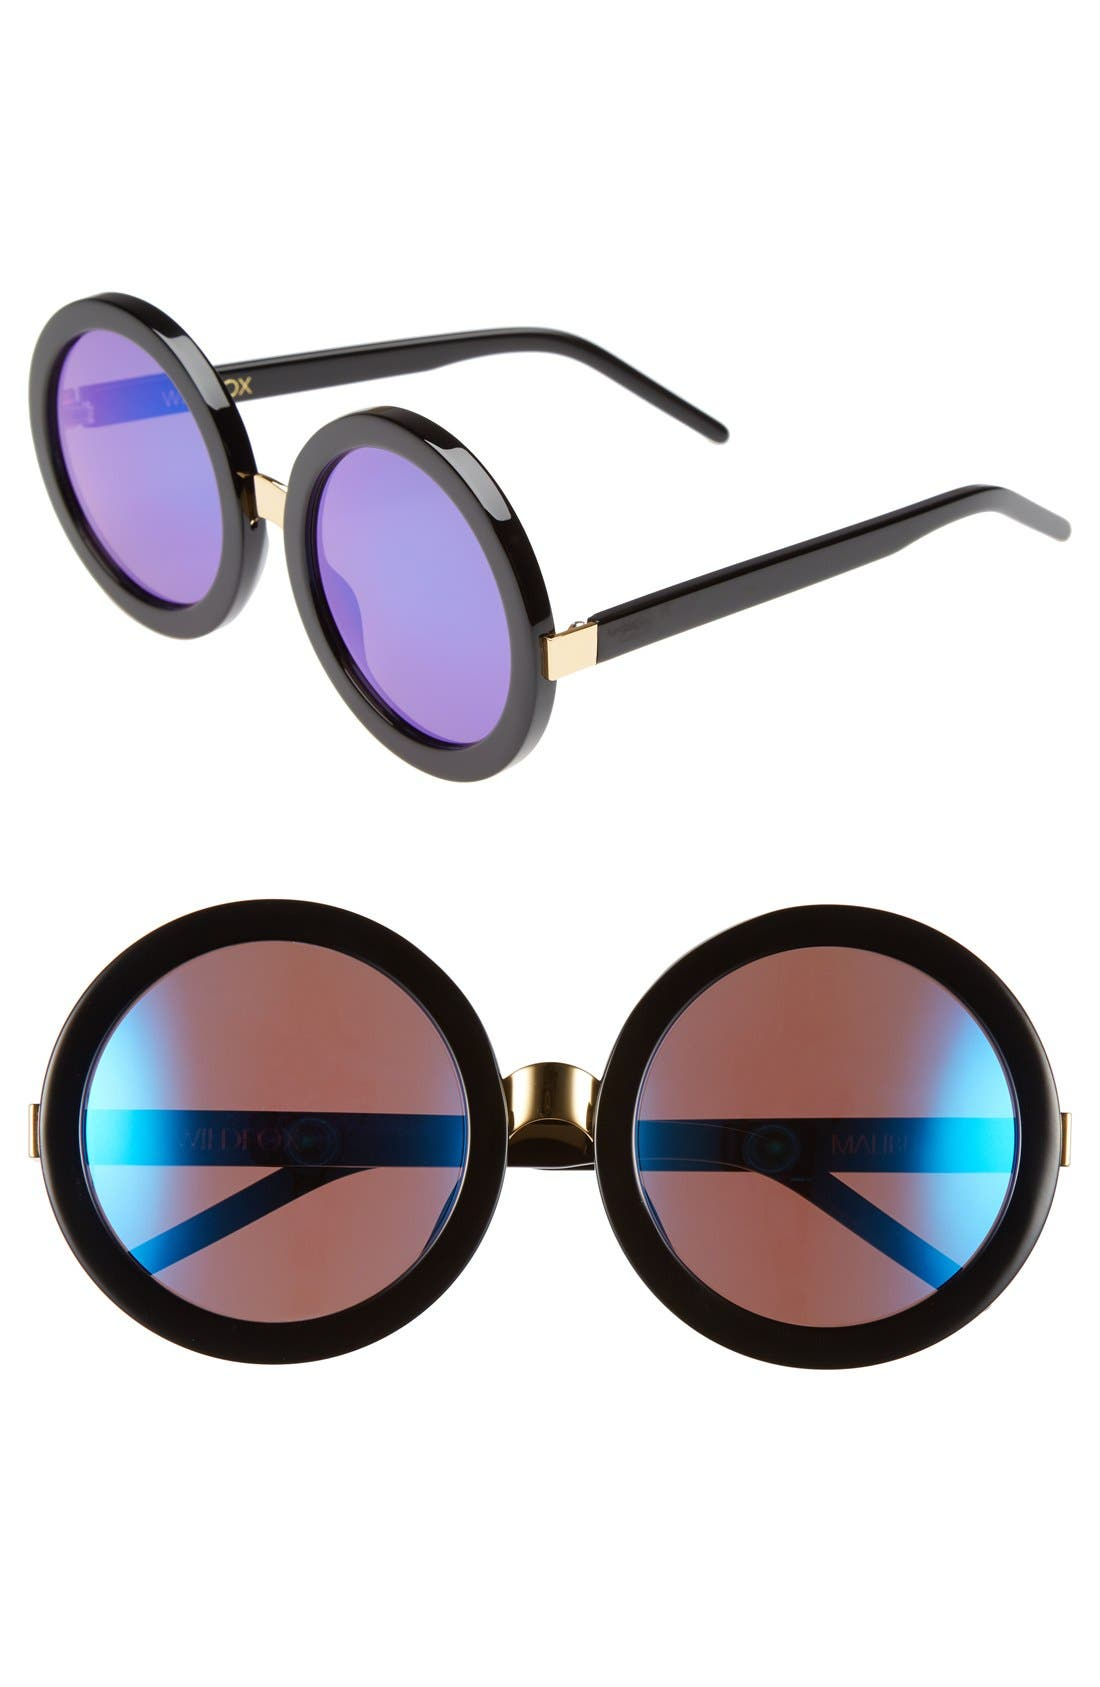 'Malibu Deluxe' 55mm Retro Sunglasses,                             Main thumbnail 1, color,                             BLACK